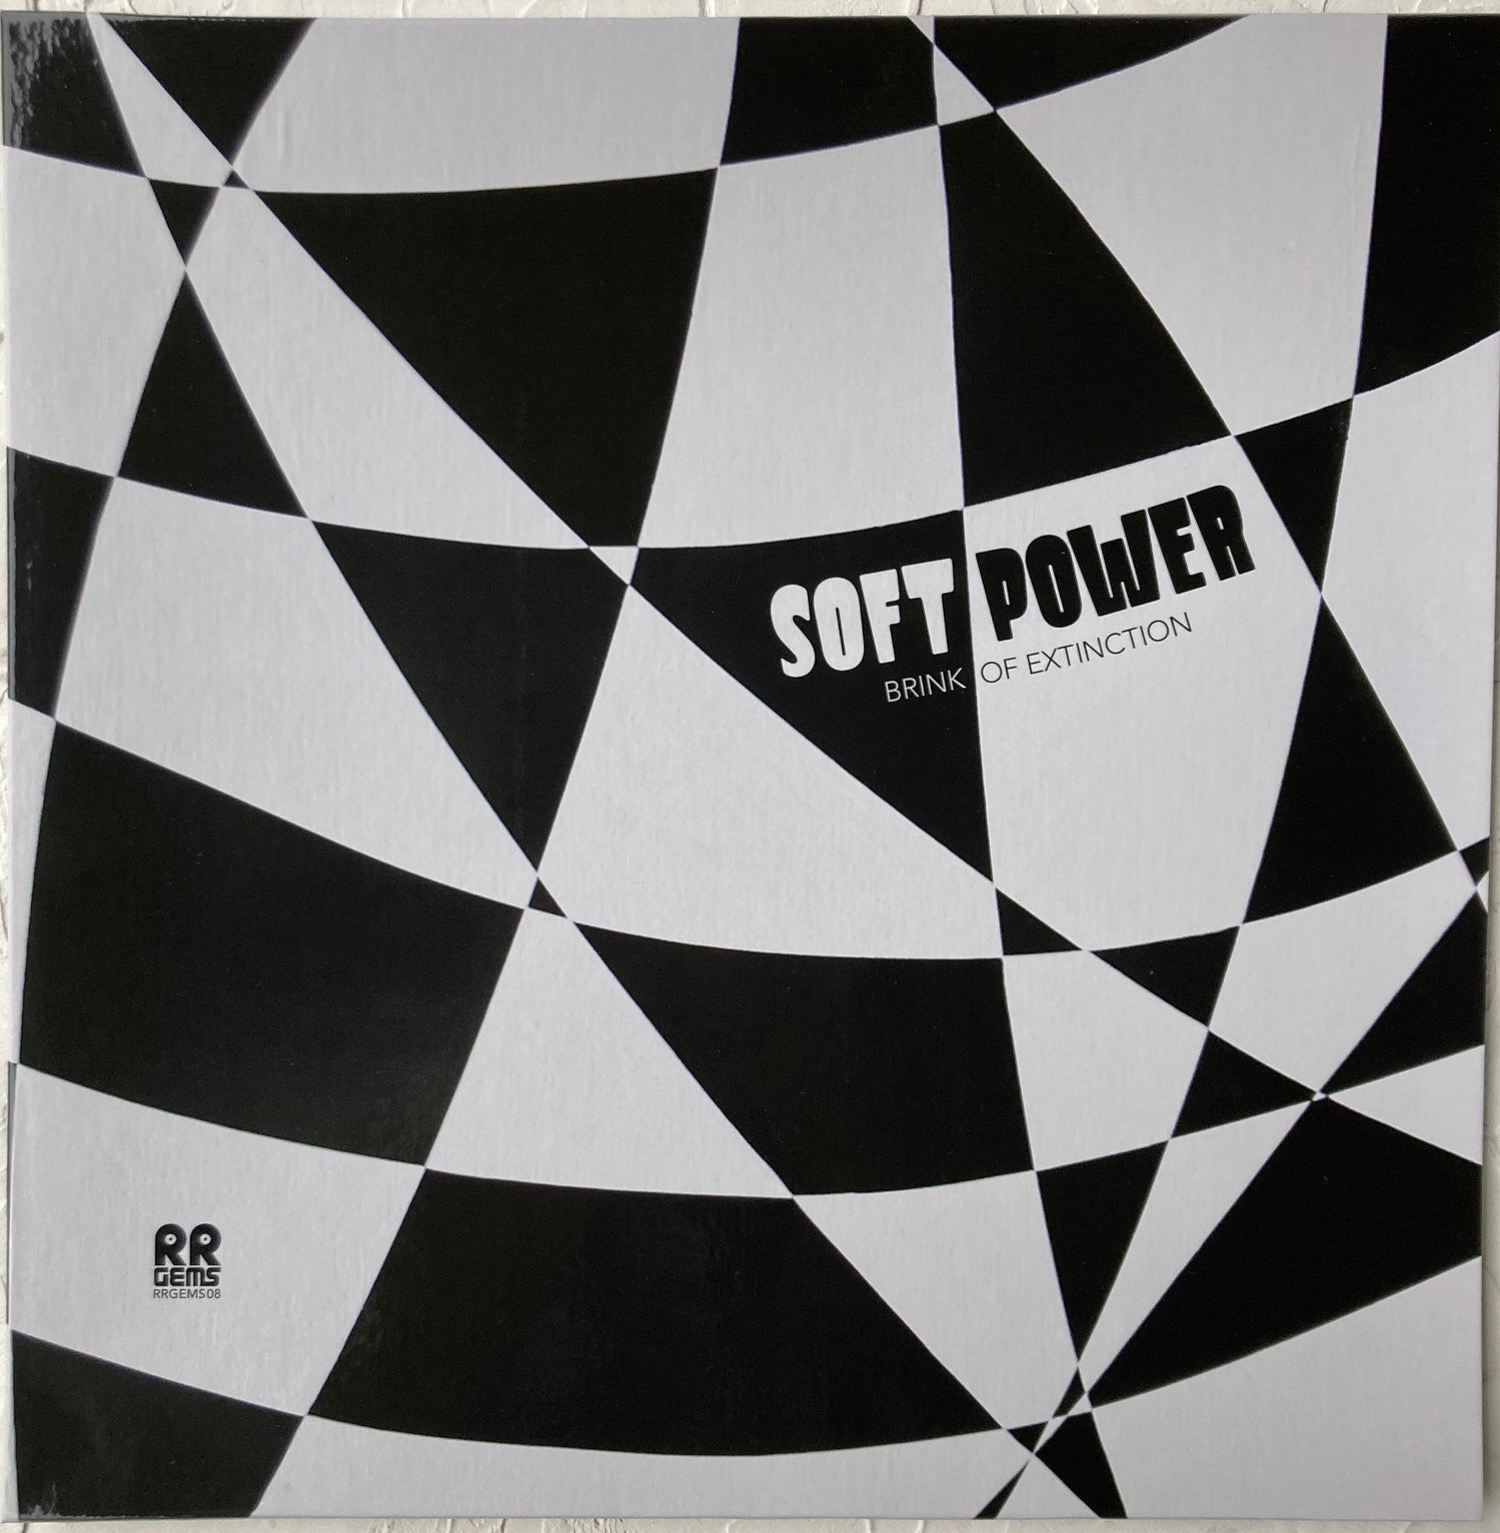 Image of SOFT POWER - BRINK OF EXTINCTION - RRGEMS08; Edition#2